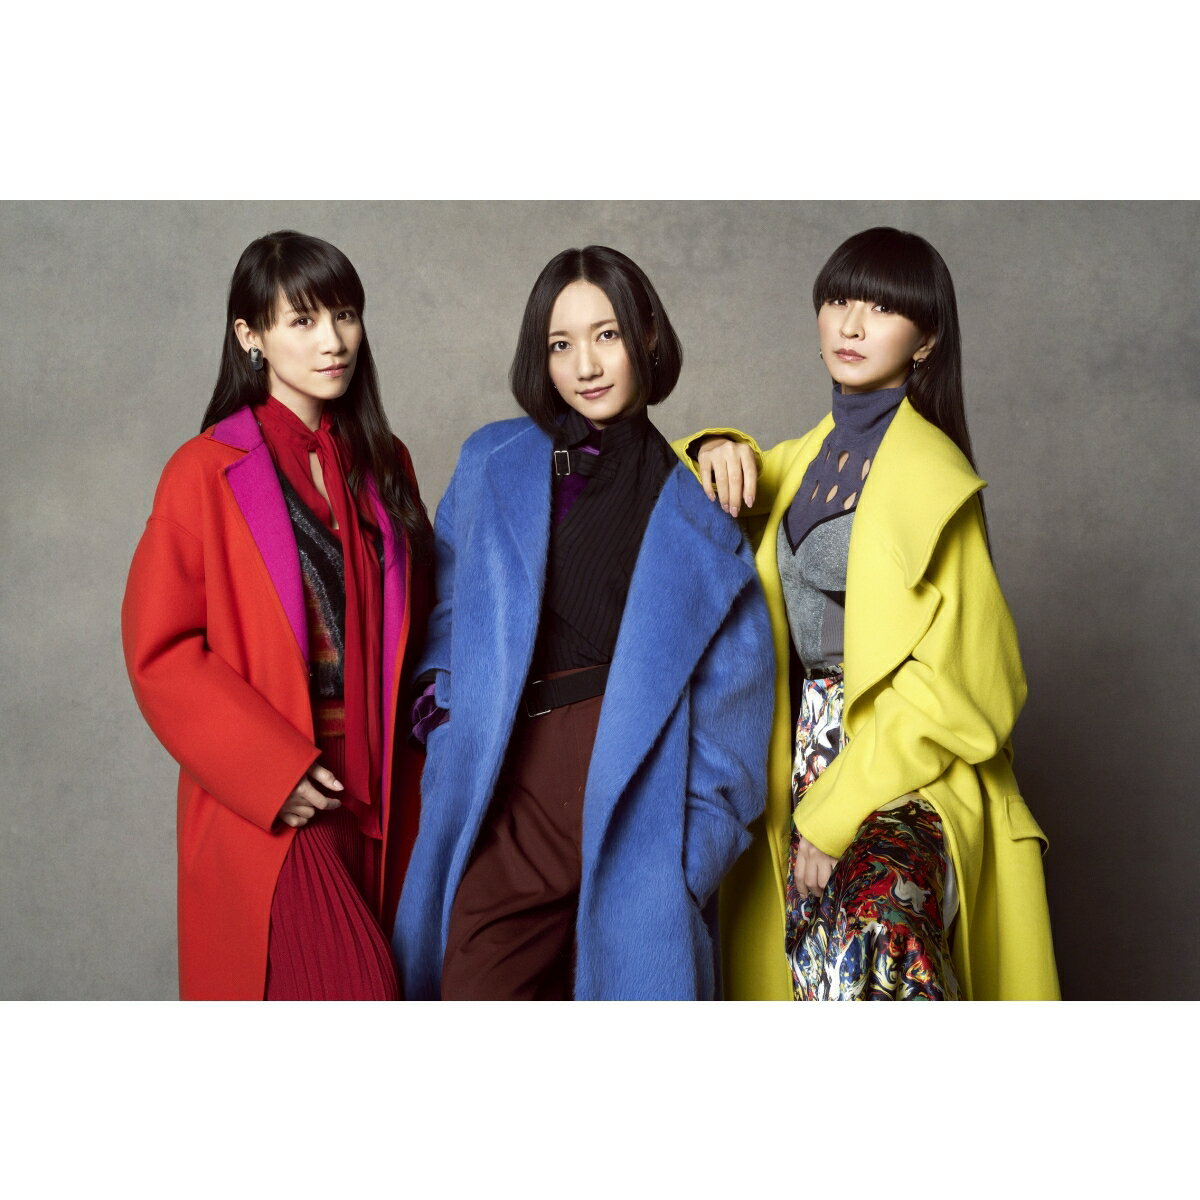 Perfume Clips 2(初回限定盤)【Blu-ray】 [ Perfume ]